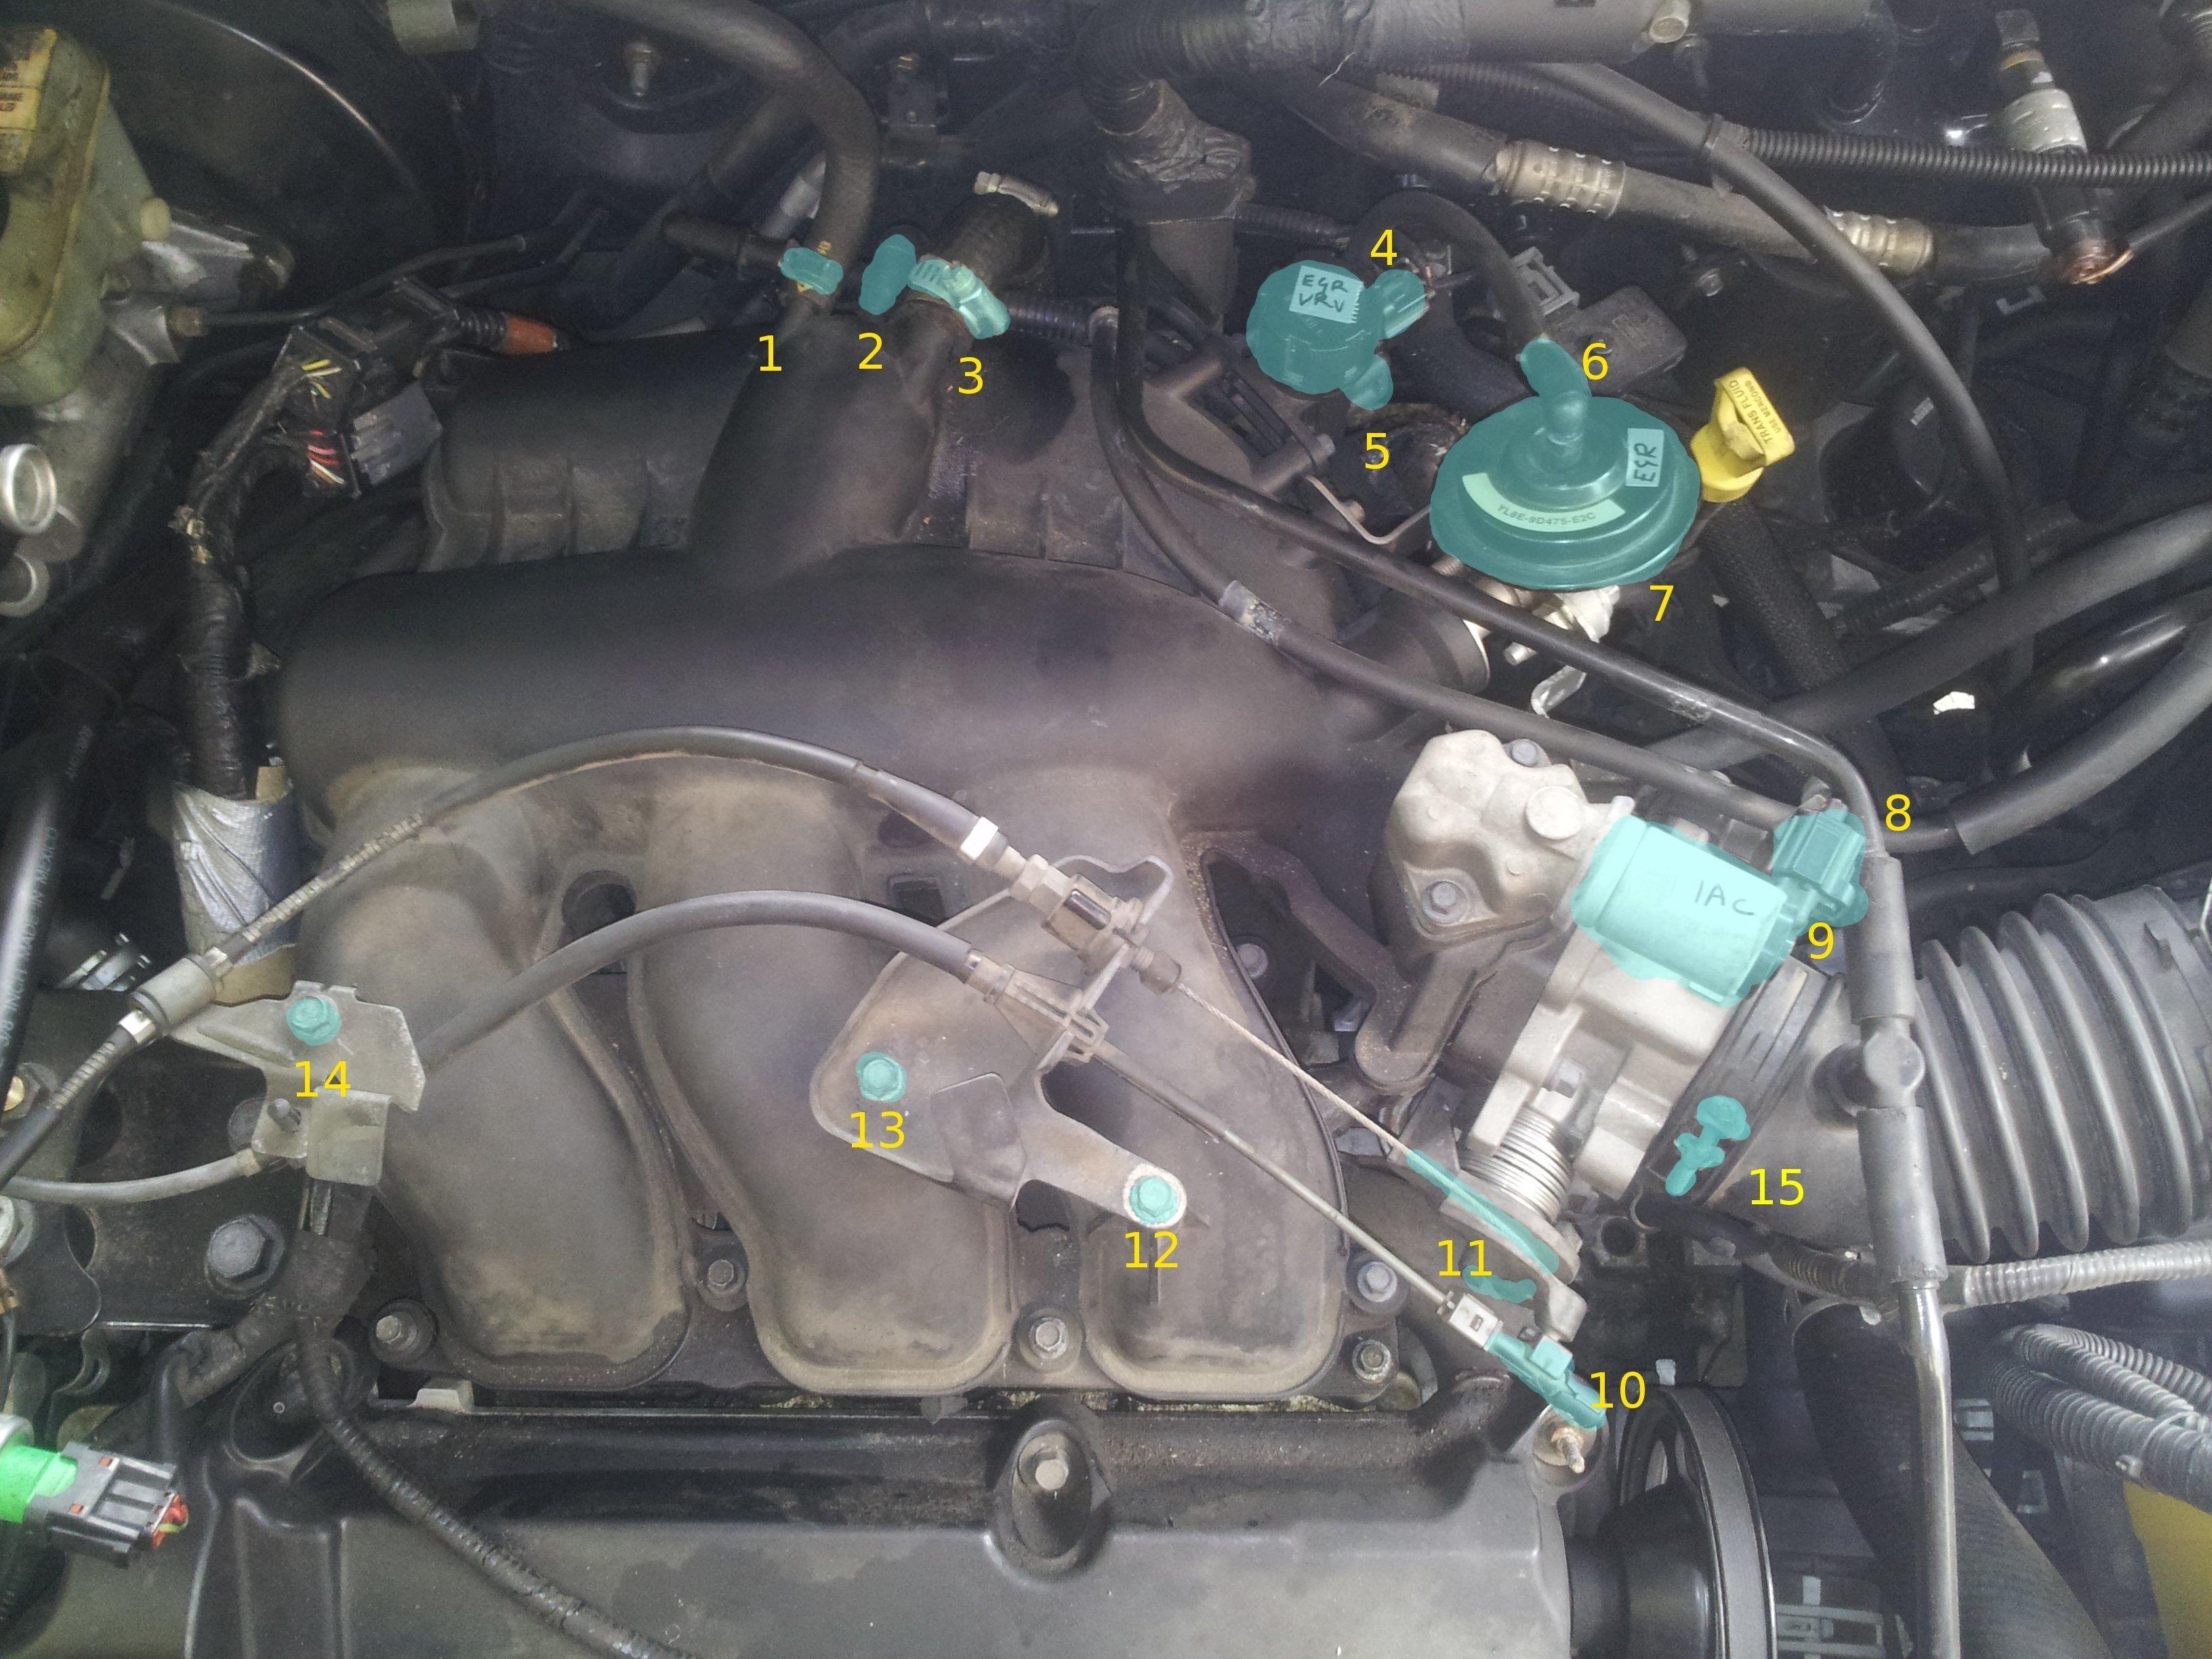 2002 mazda tribute engine diagram wiring schematic diagram 2004 Mazda Tribute Cylinder Diagram